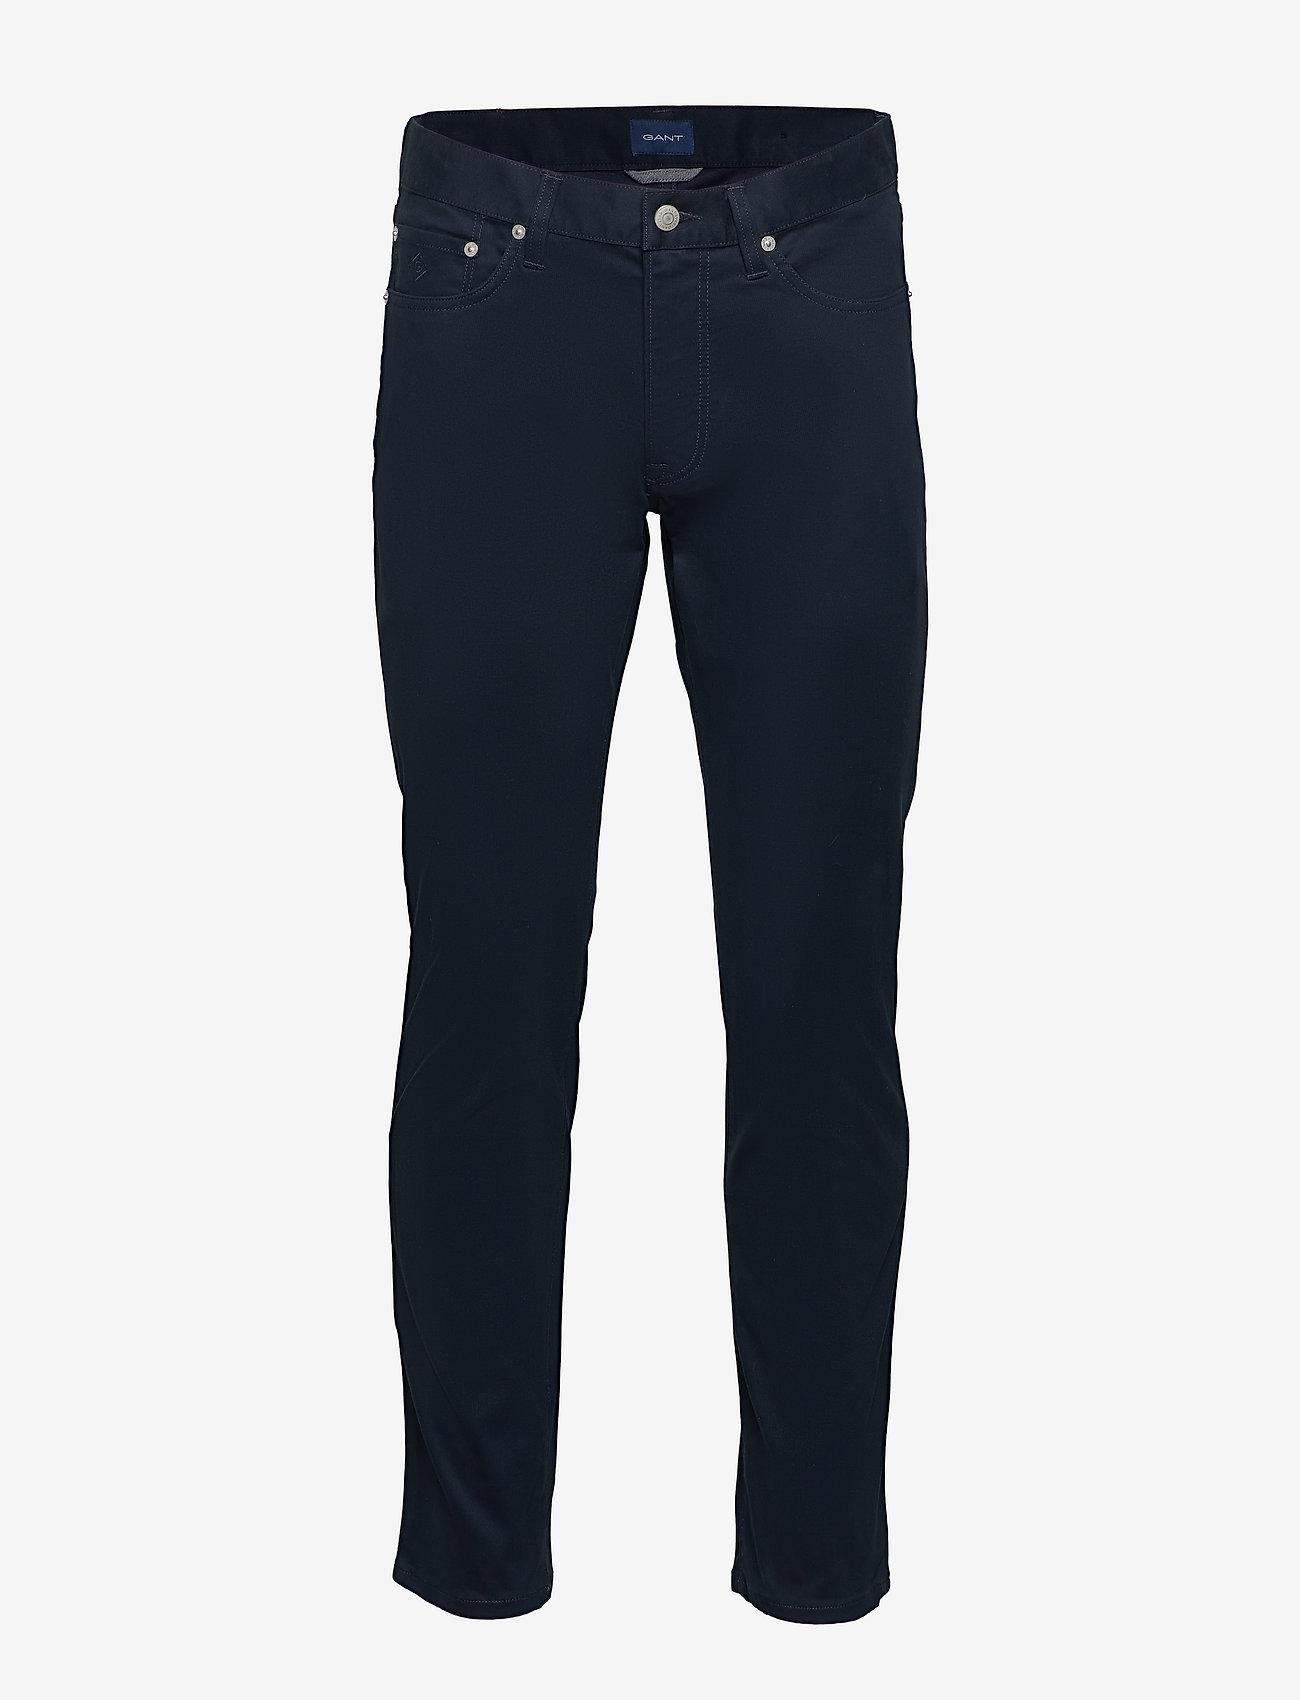 GANT - D1. TP SLIM BEDFORD JEANS - slim jeans - navy - 0